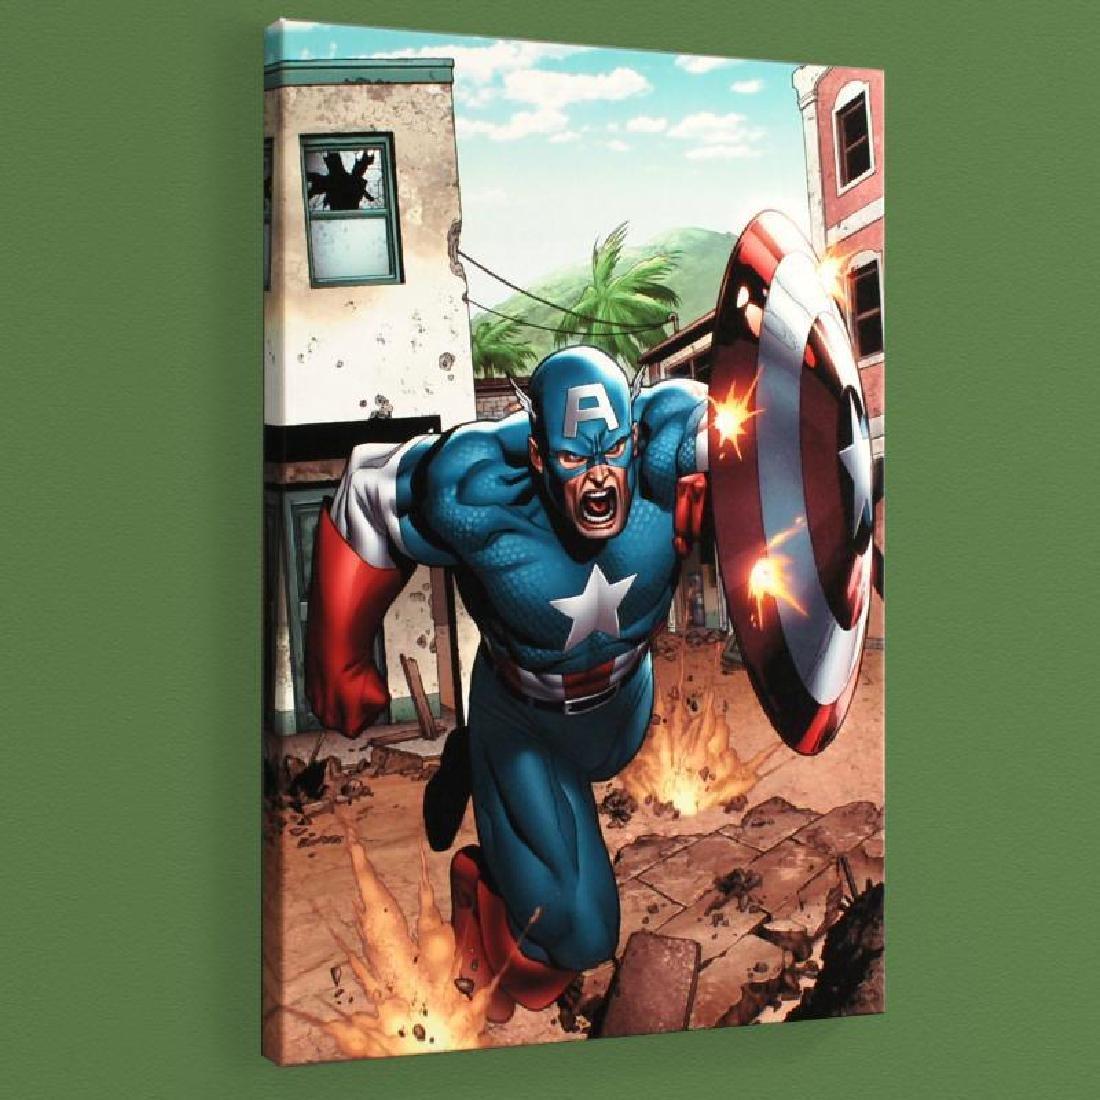 Marvel Adventures: Super Heroes #8 by Marvel Comics - 3